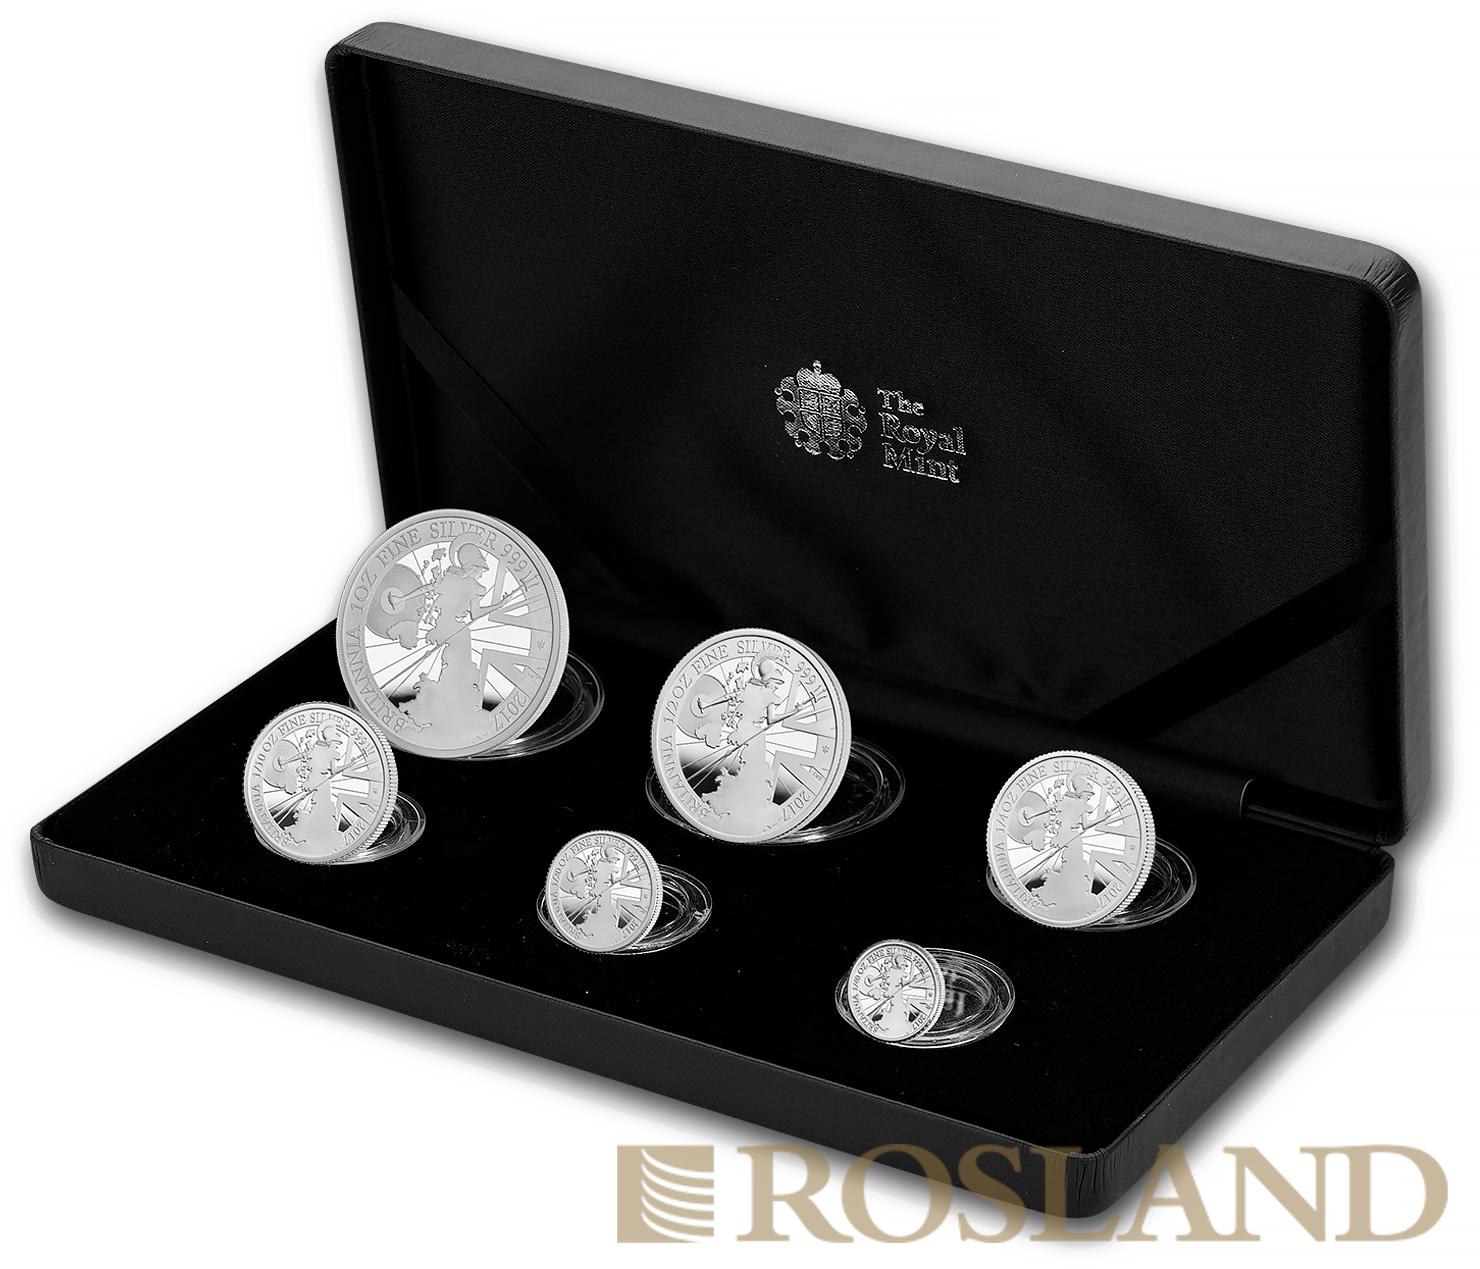 6 Silbermünzen Set Britannia 2017 - 20 Jähriges Jubiläum PP (Box, Zertifikat)